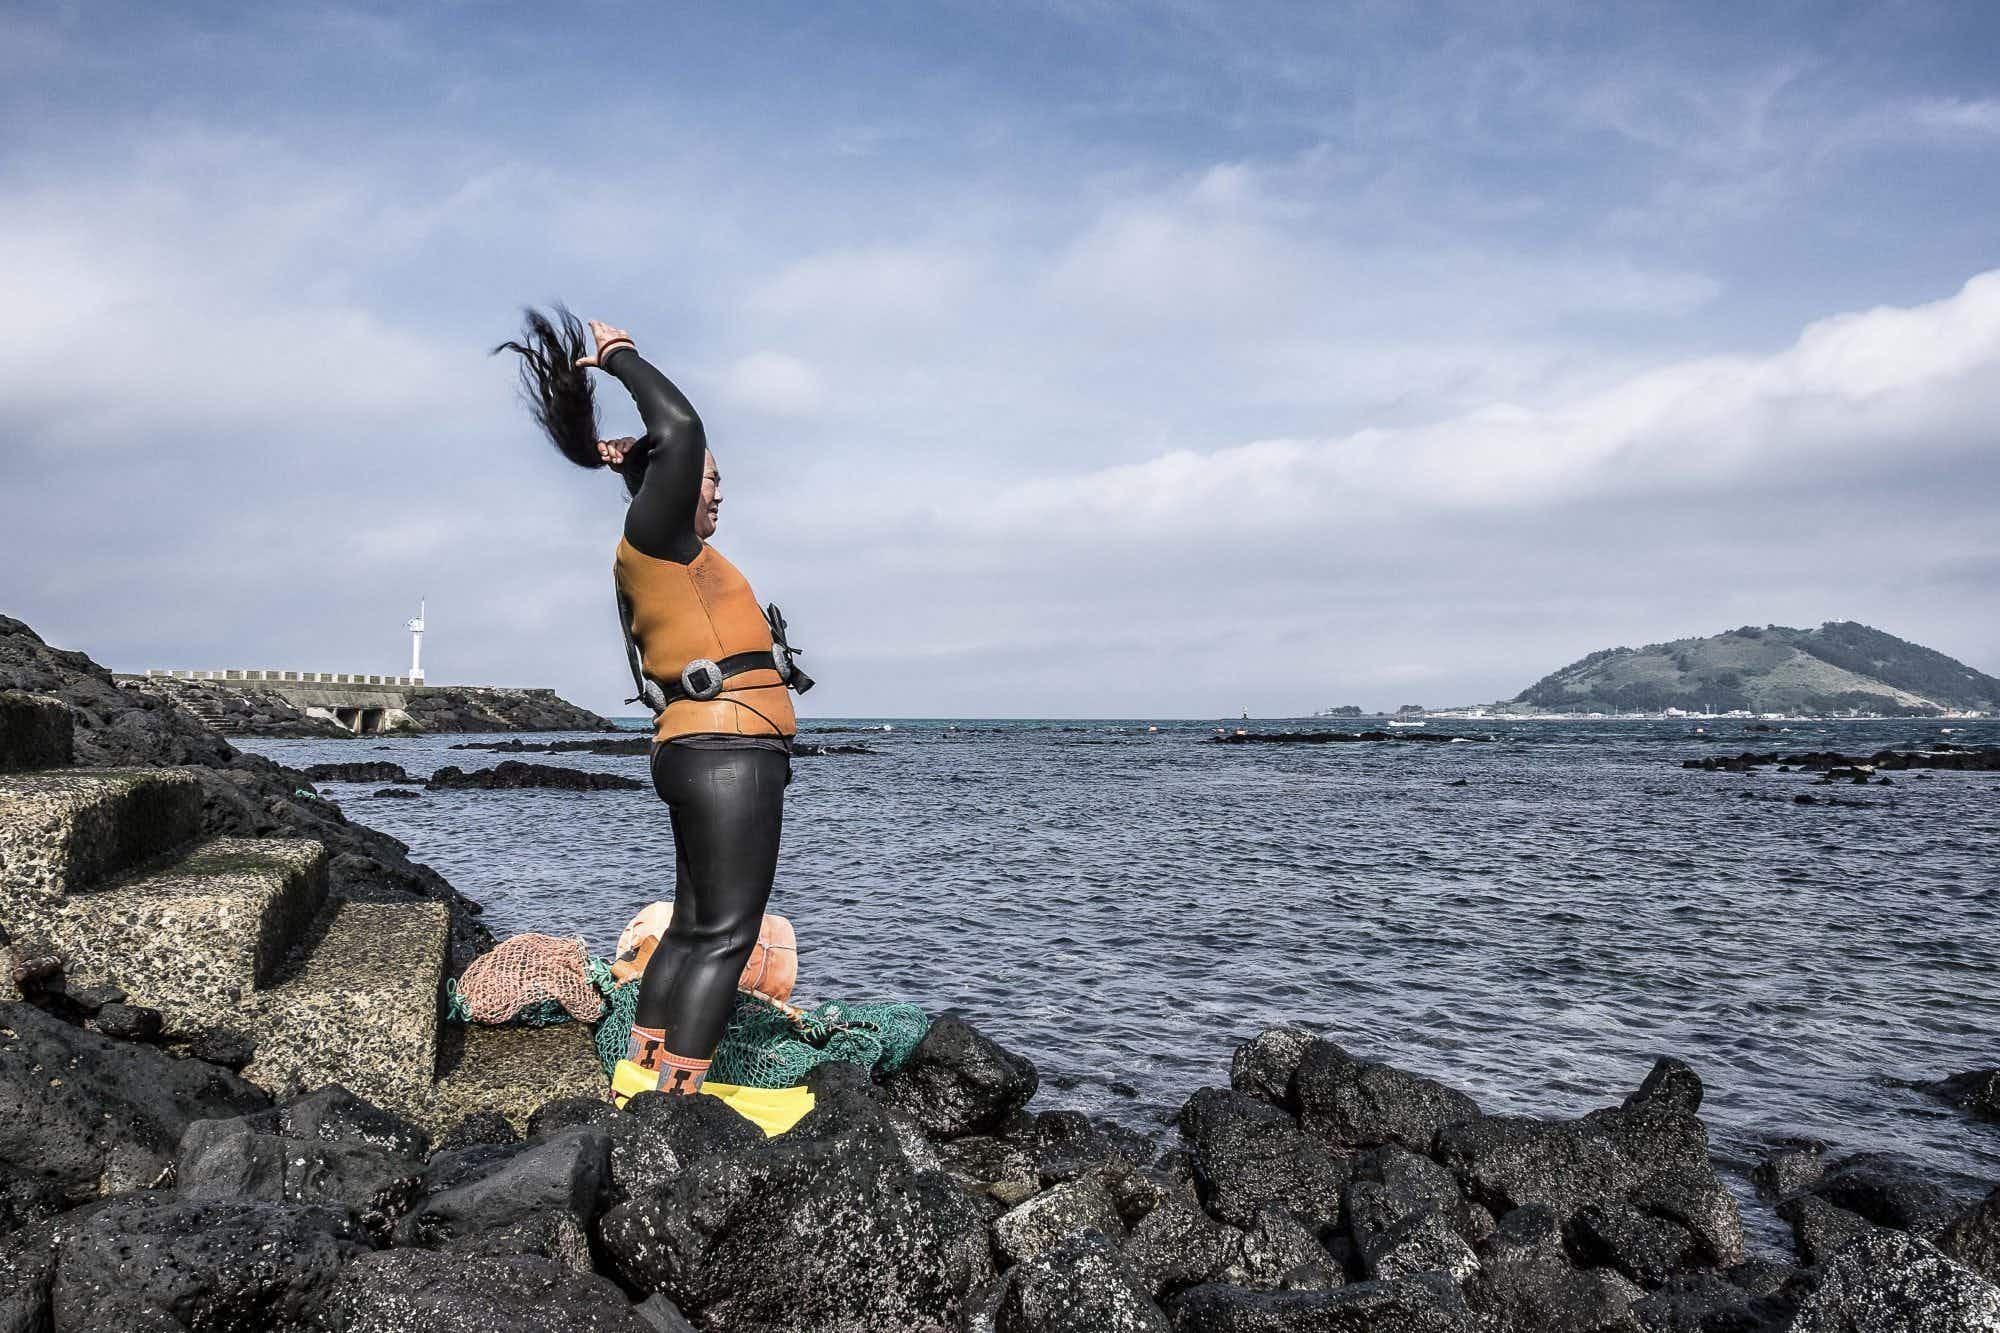 The extraordinary lives of South Korea's Mermaids of Jeju captured in evocative photo essay